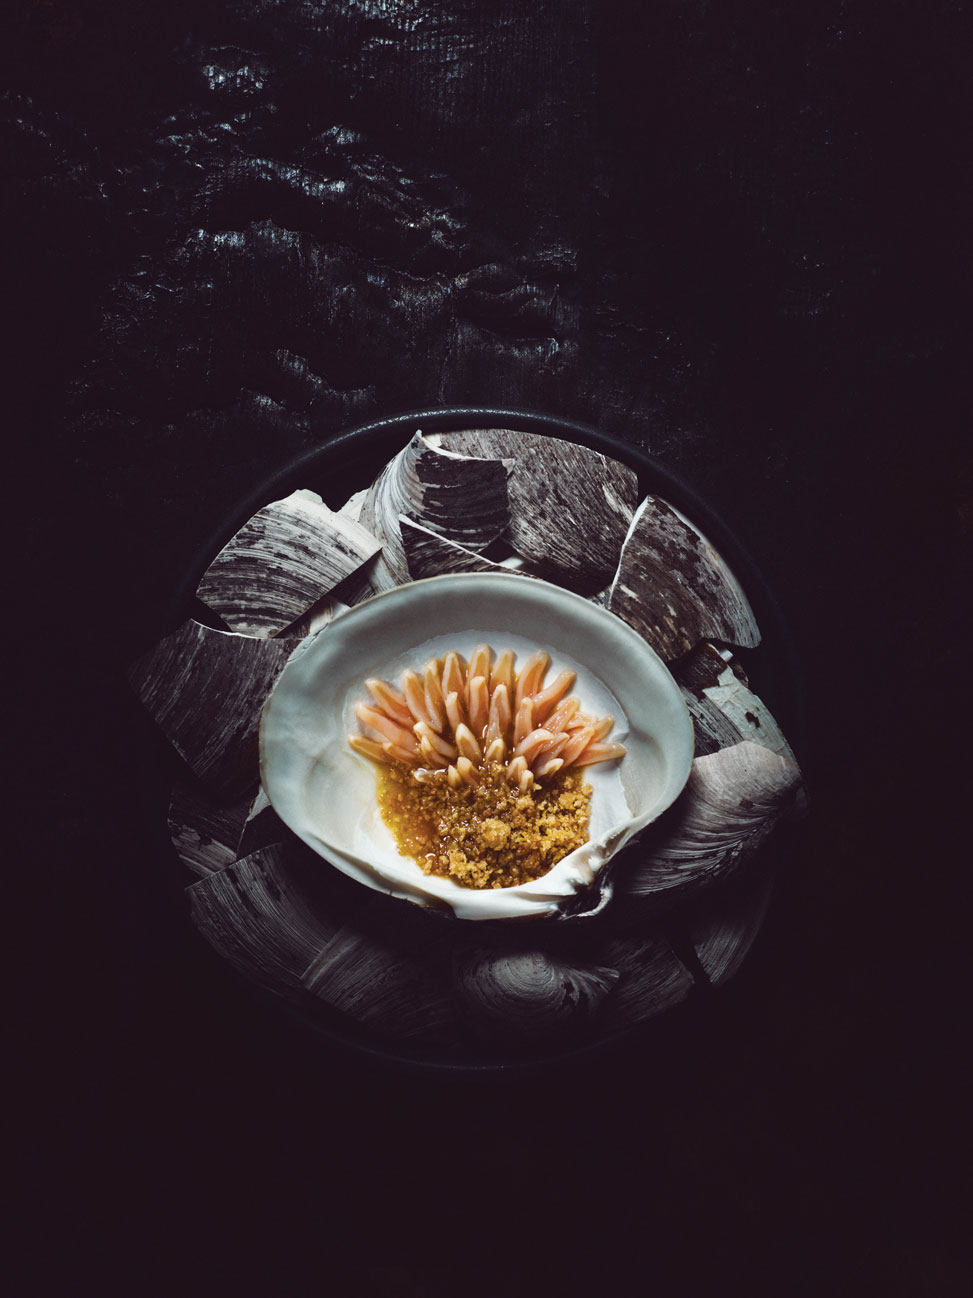 Mahogany clams, raw and diced, served with a dashi of Norwegian shiitake mushrooms from Telemark, and seaweed.Photography by Tuukka Koski